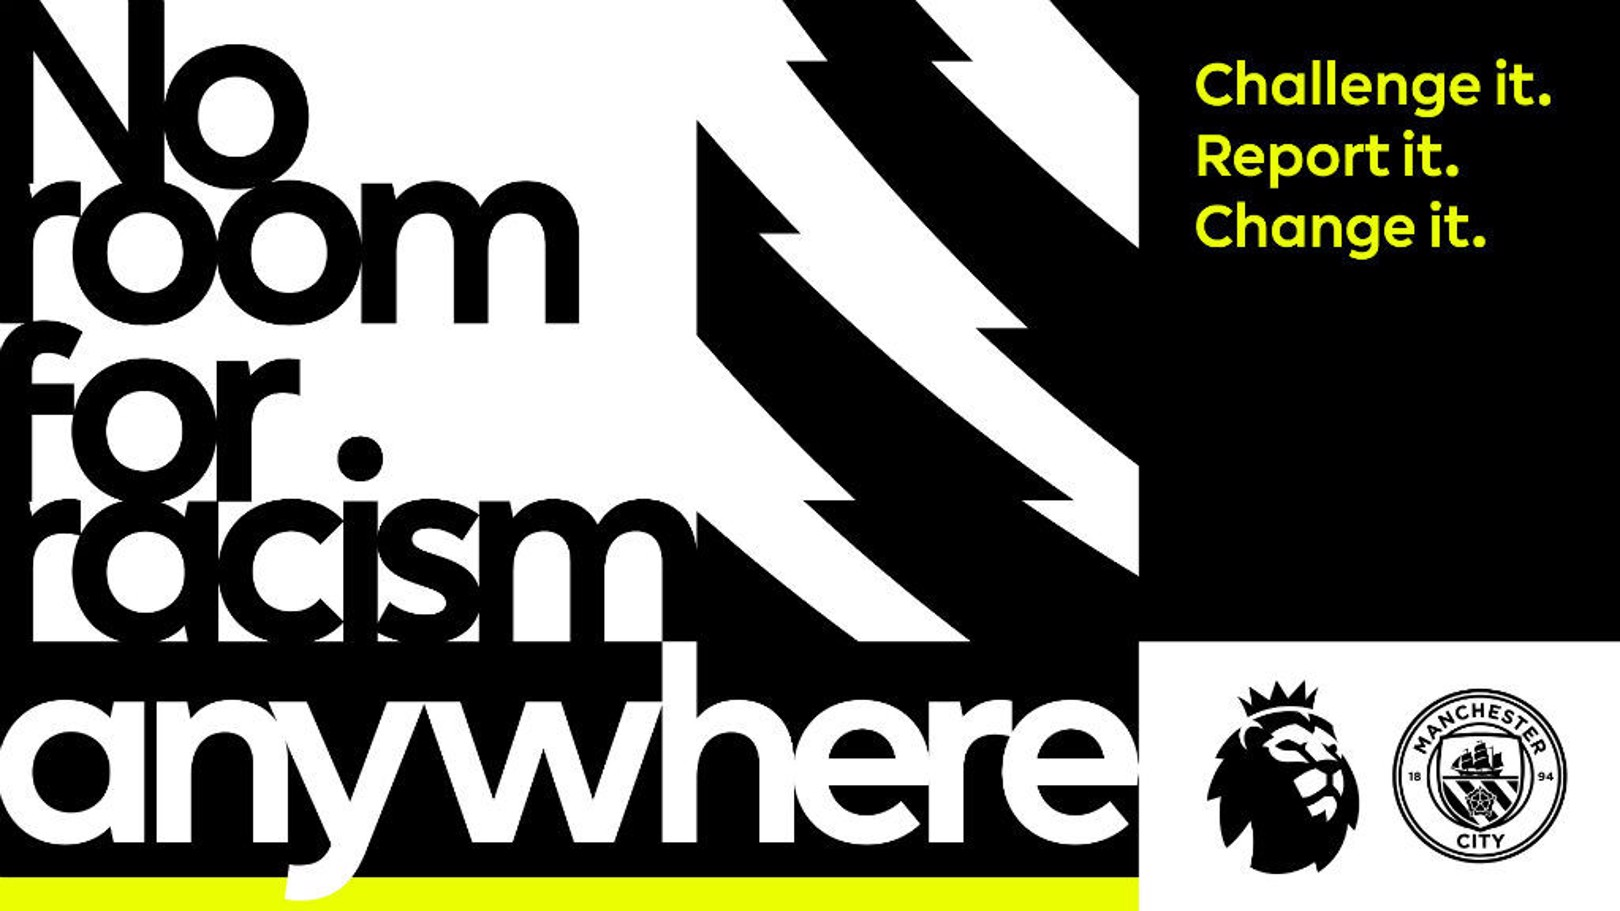 'No Room For Racism' 캠페인을 지지하는 CITY